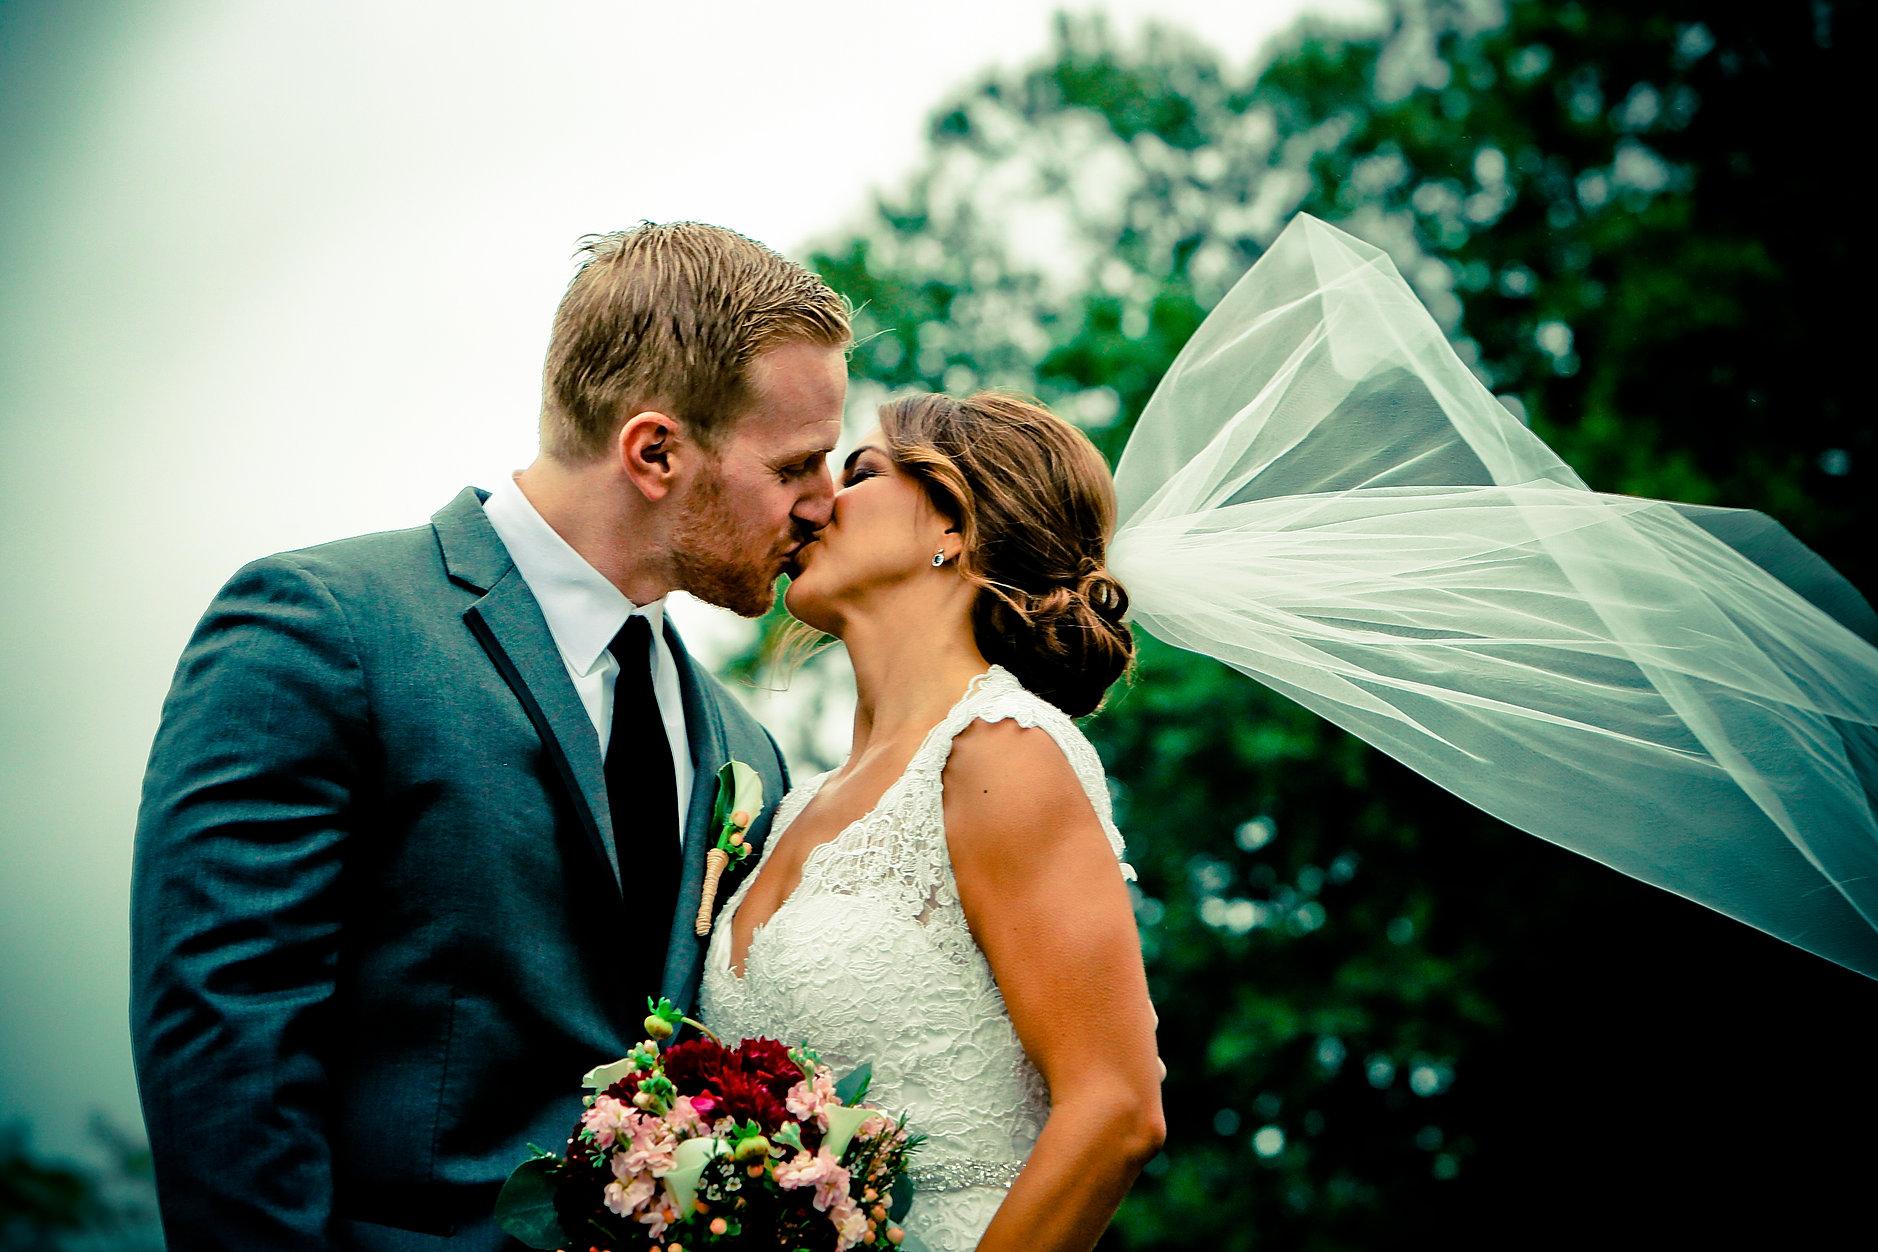 Nj wedding